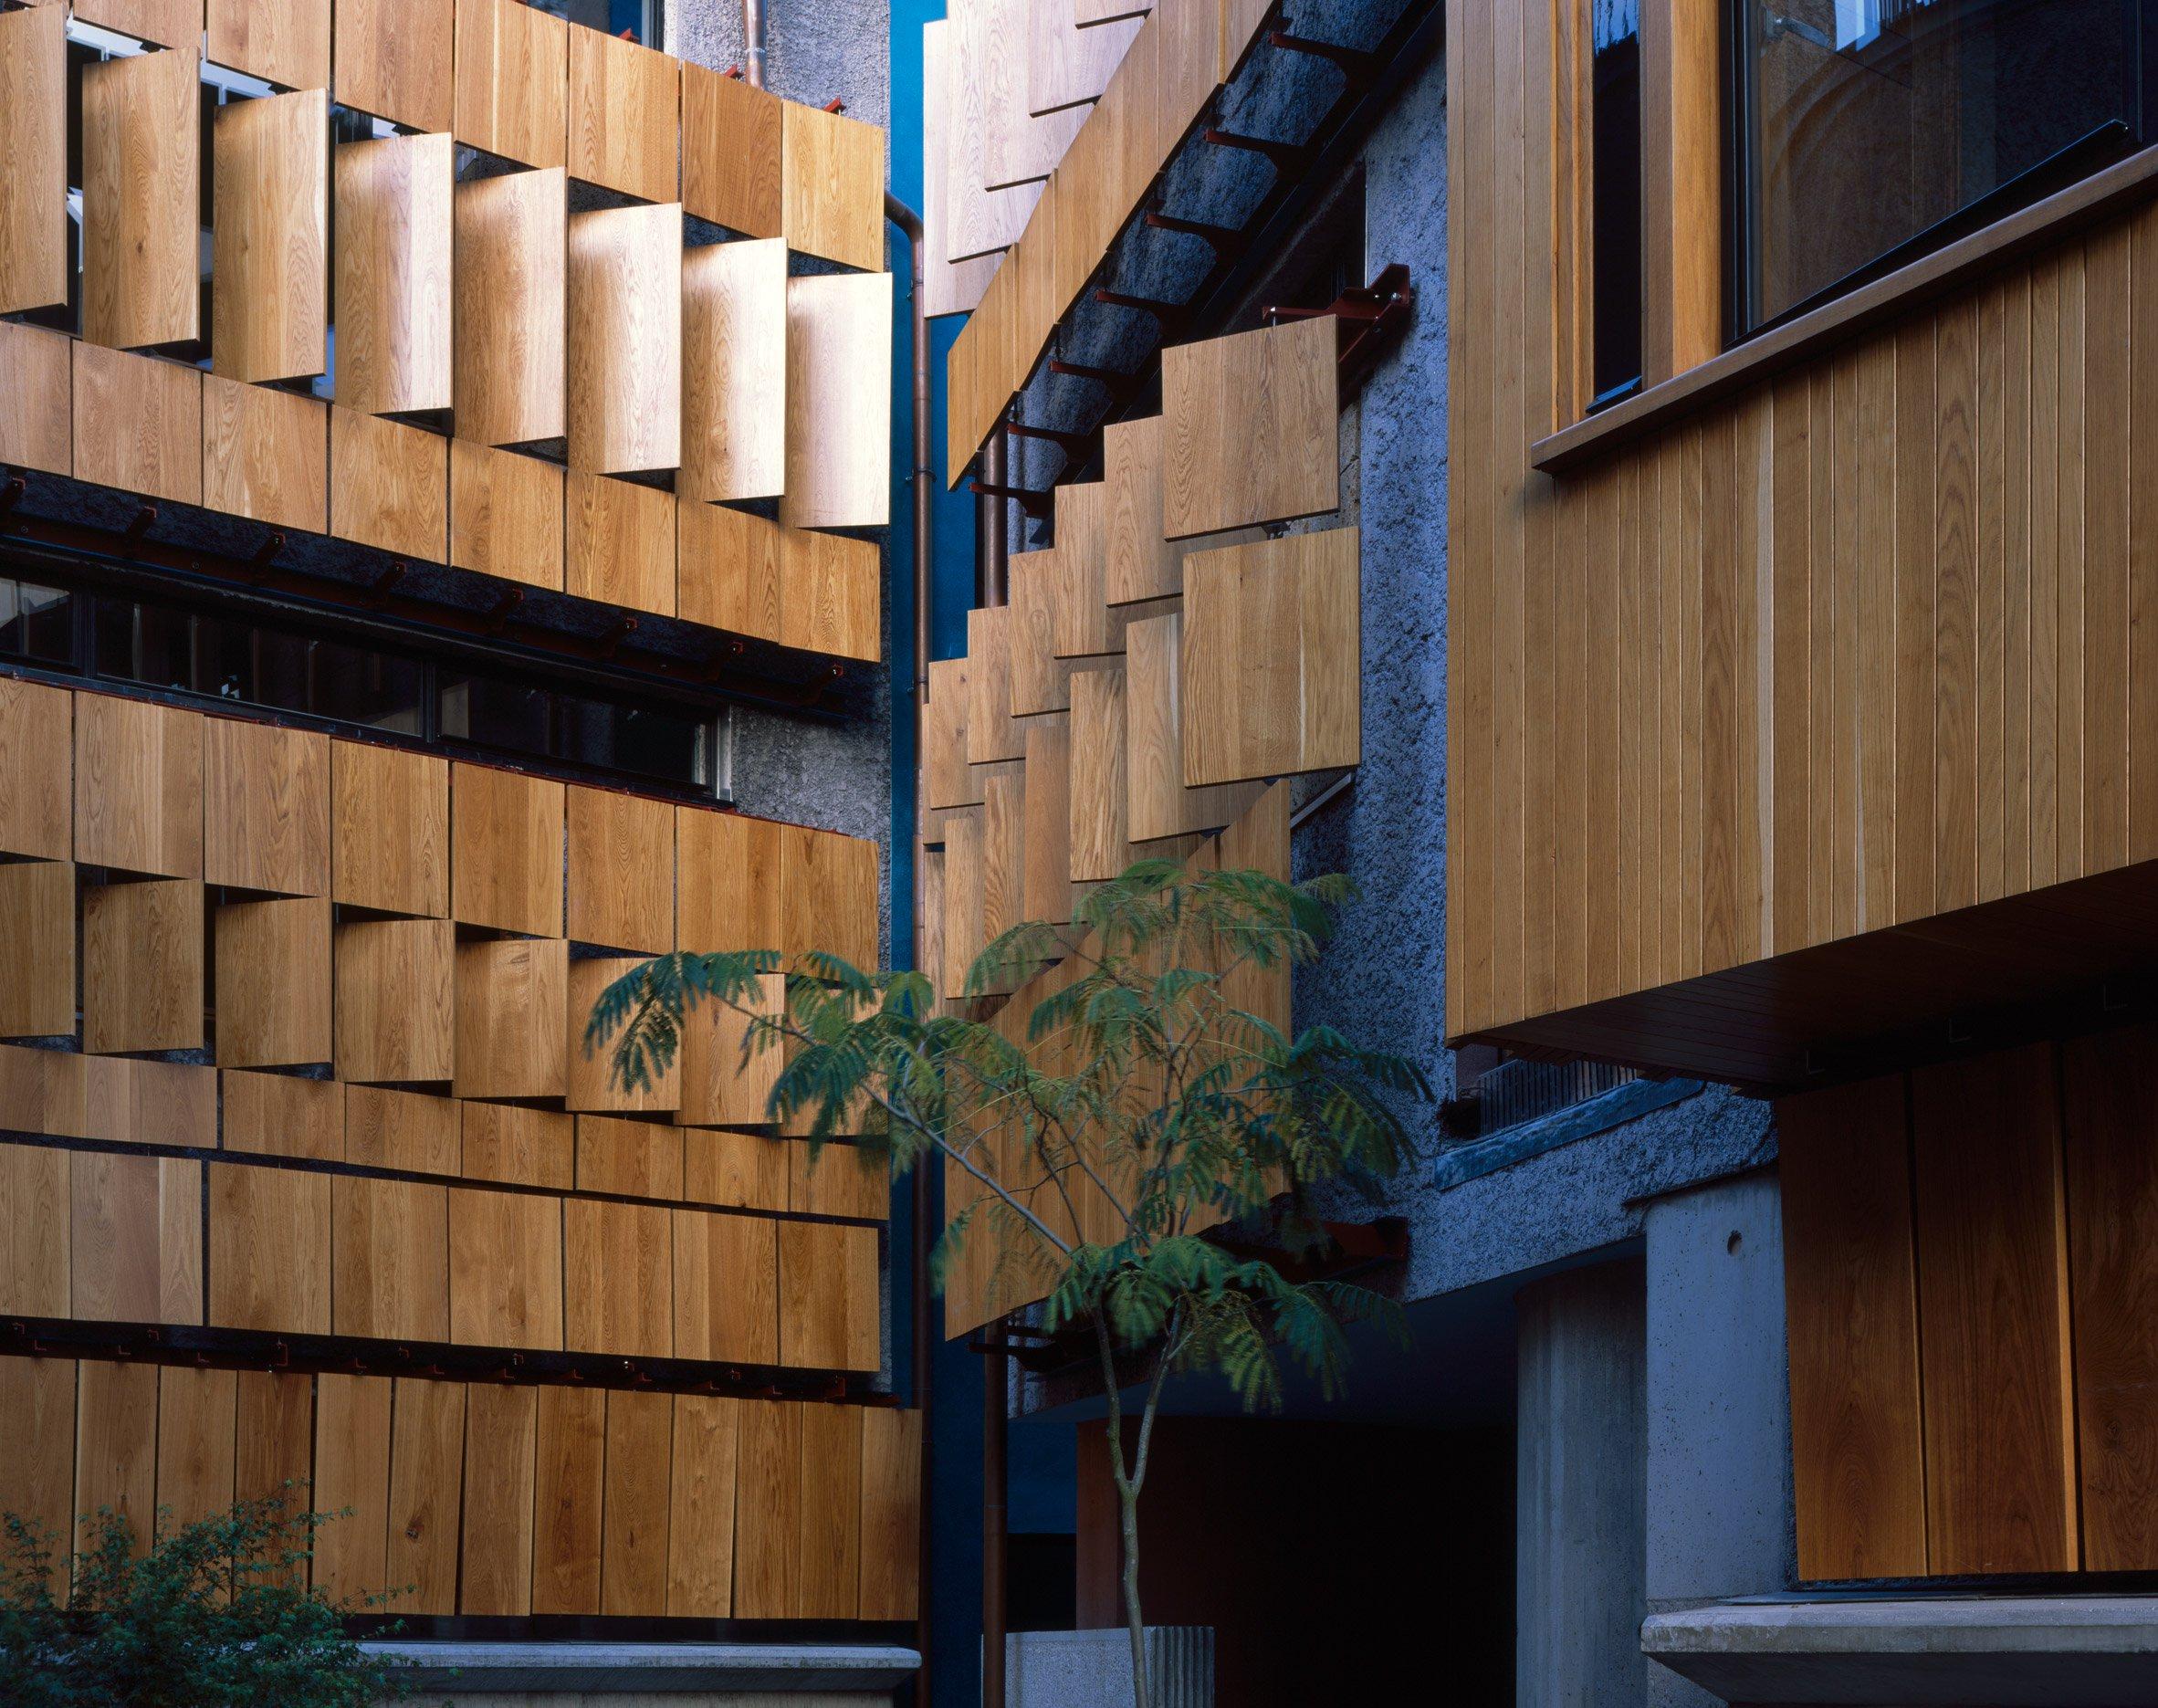 walmer-yard-architecture-residential-peter-salter-uk_dezeen_2364_col_1.jpg